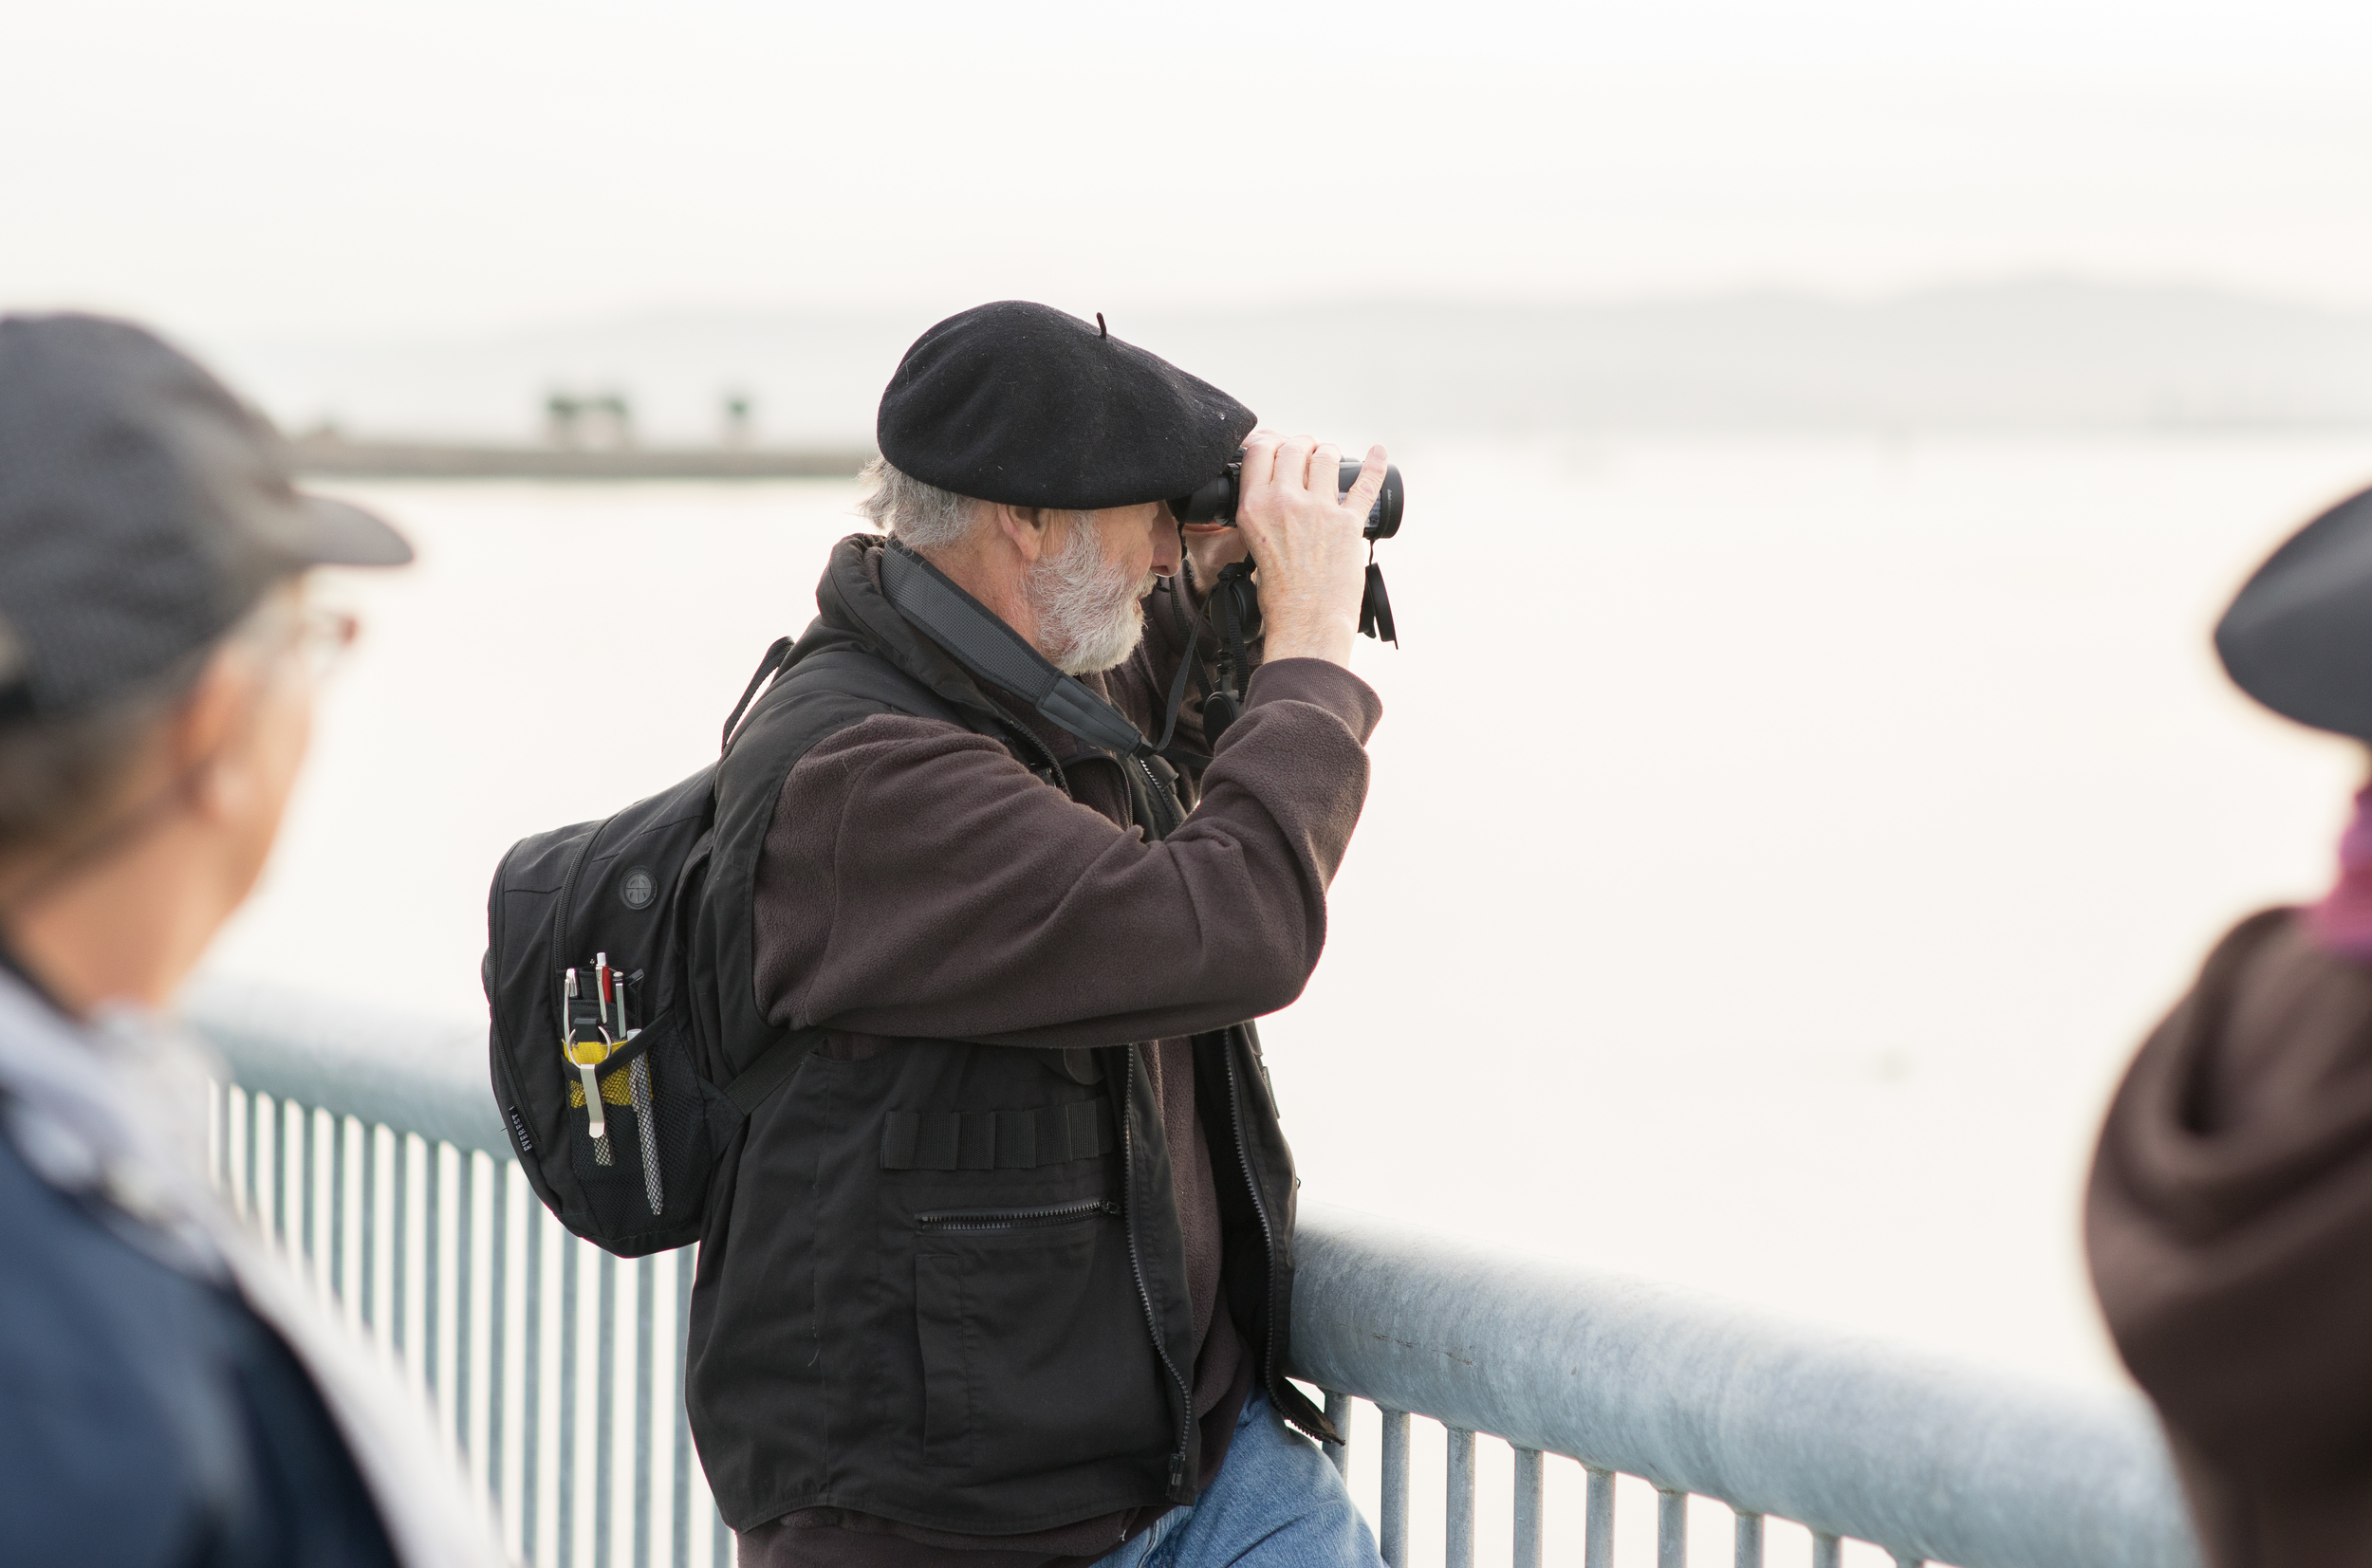 Excellent binocular posture. (Tony Iwane)